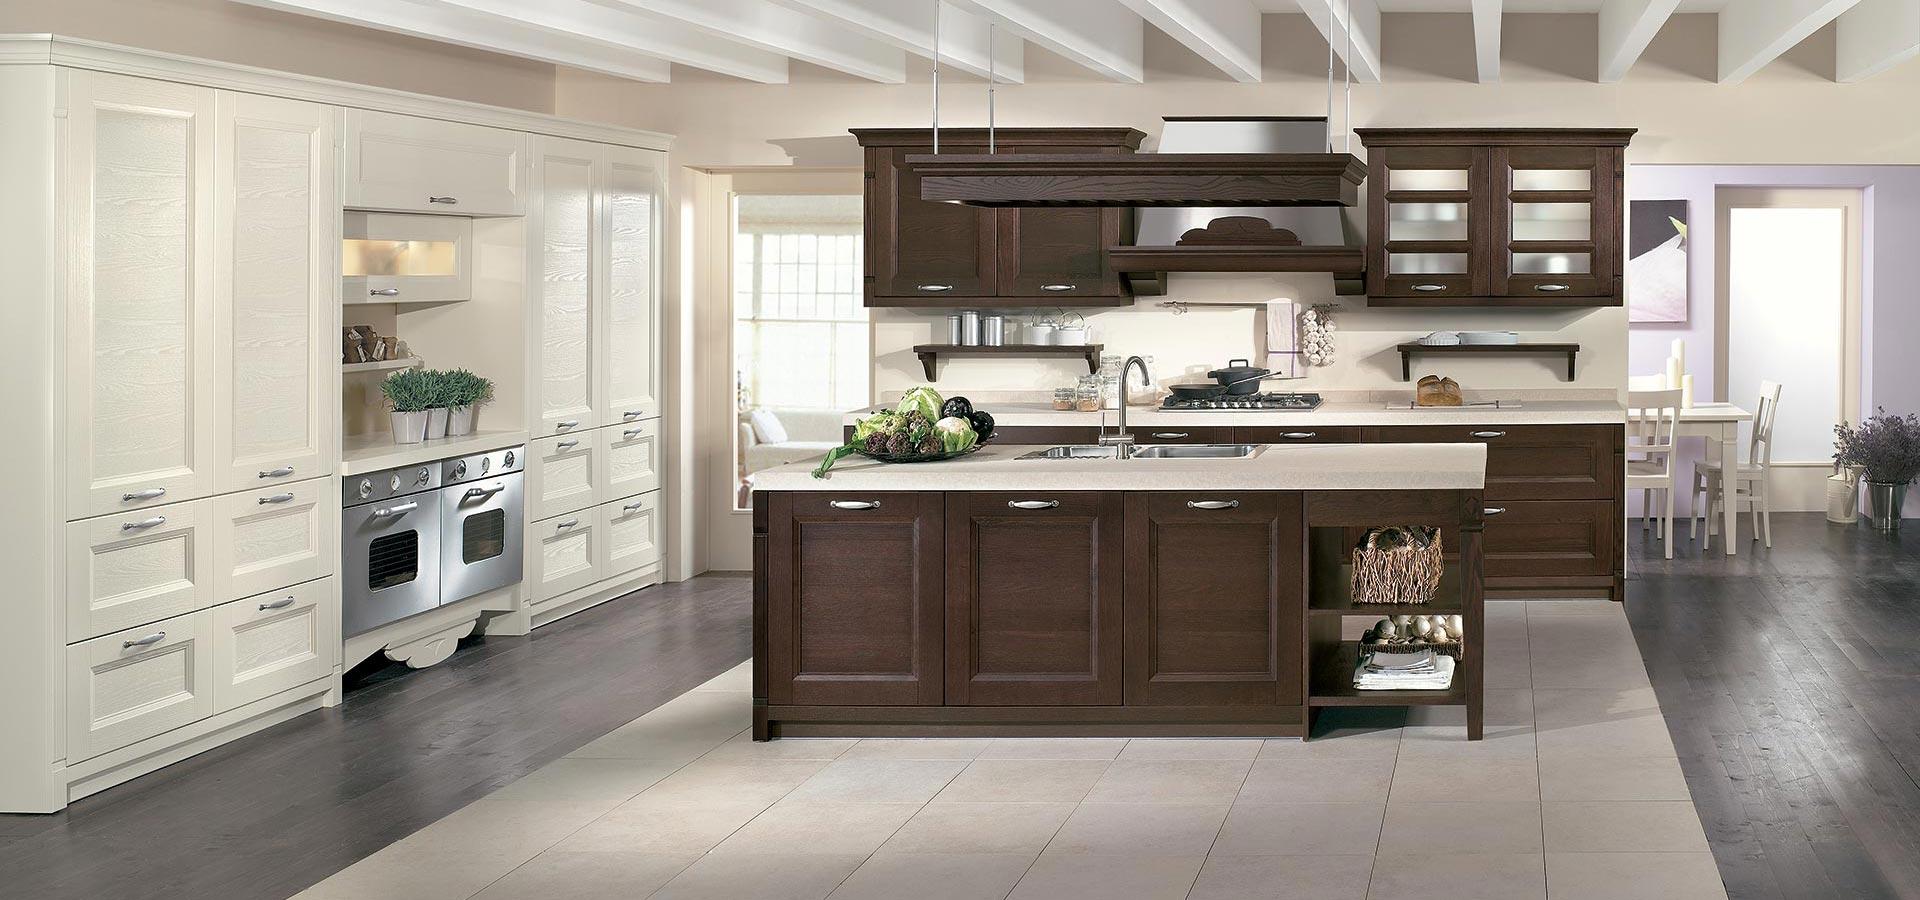 Gioiosa cucine classiche cucine componibili design - Arredo cucina classica ...